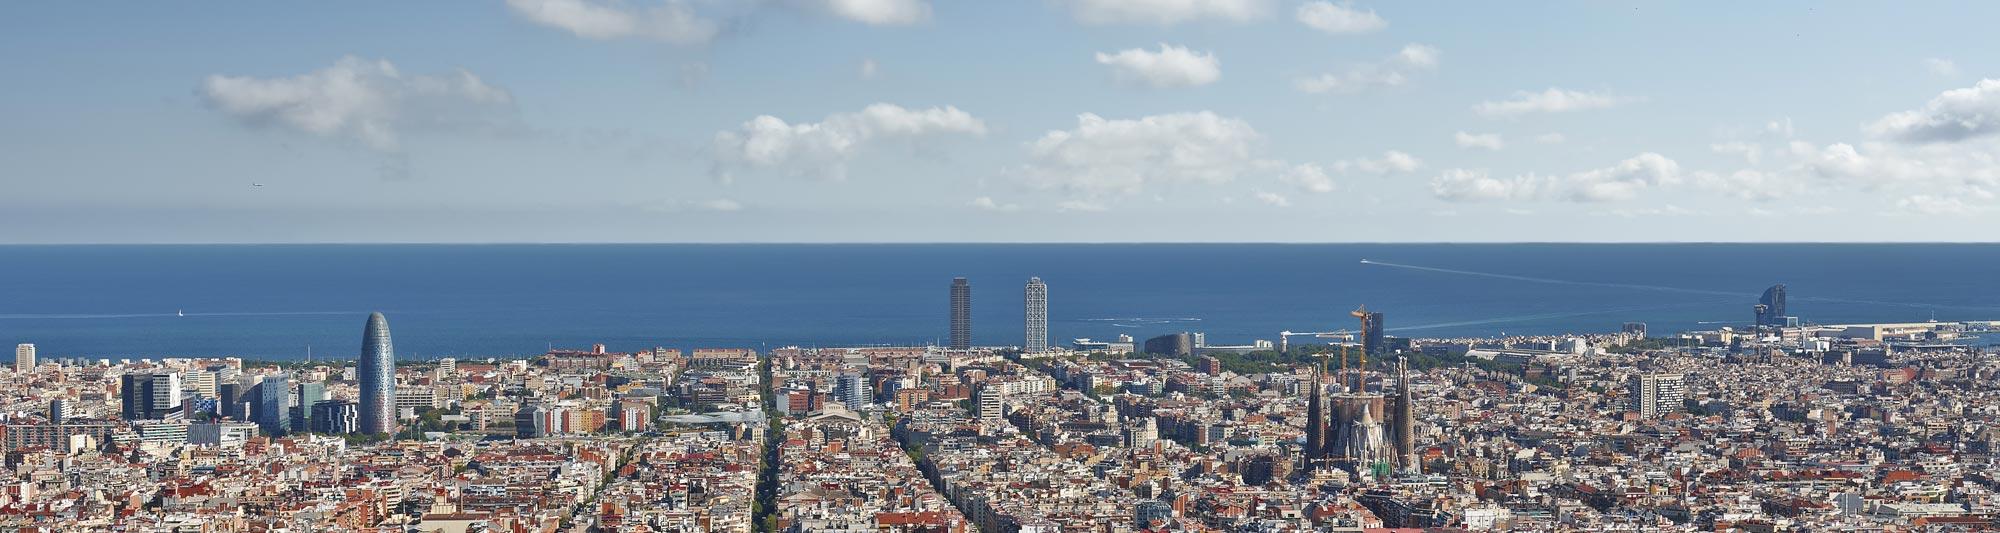 barcelona-ofertas-calderas2